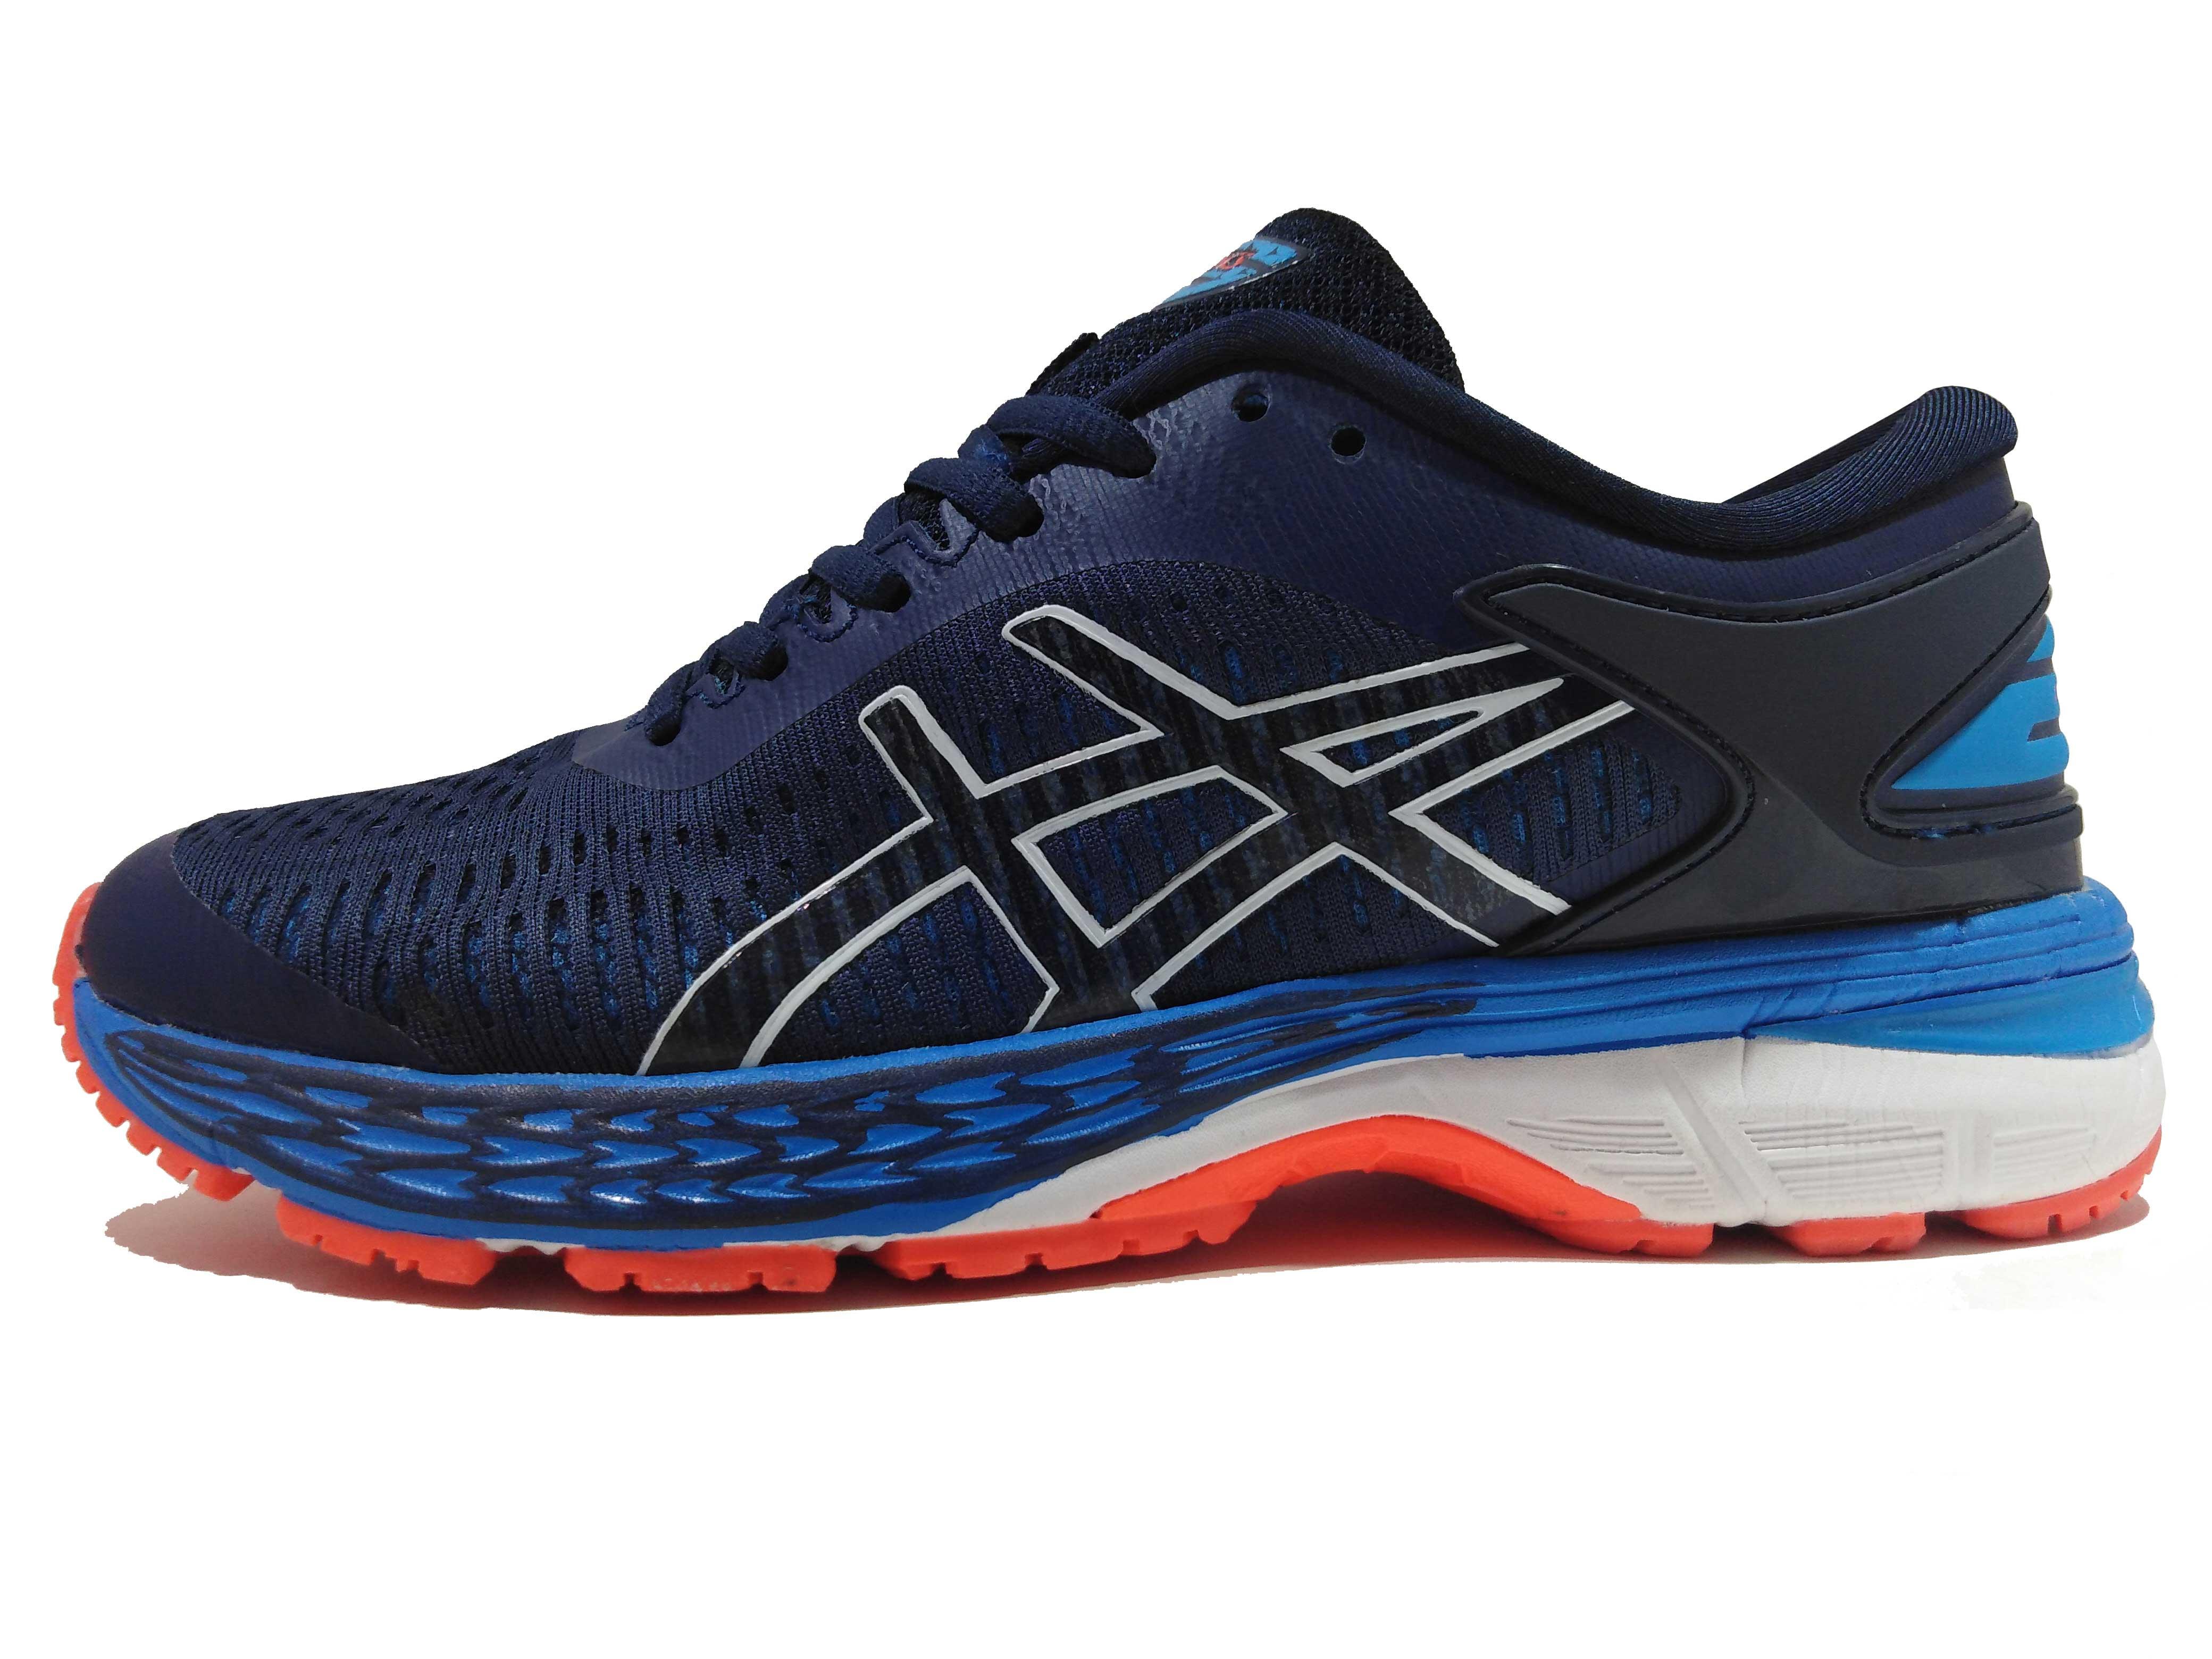 کفش مخصوص دویدن مردانه اسیکس مدل GEL - KAYANO 25